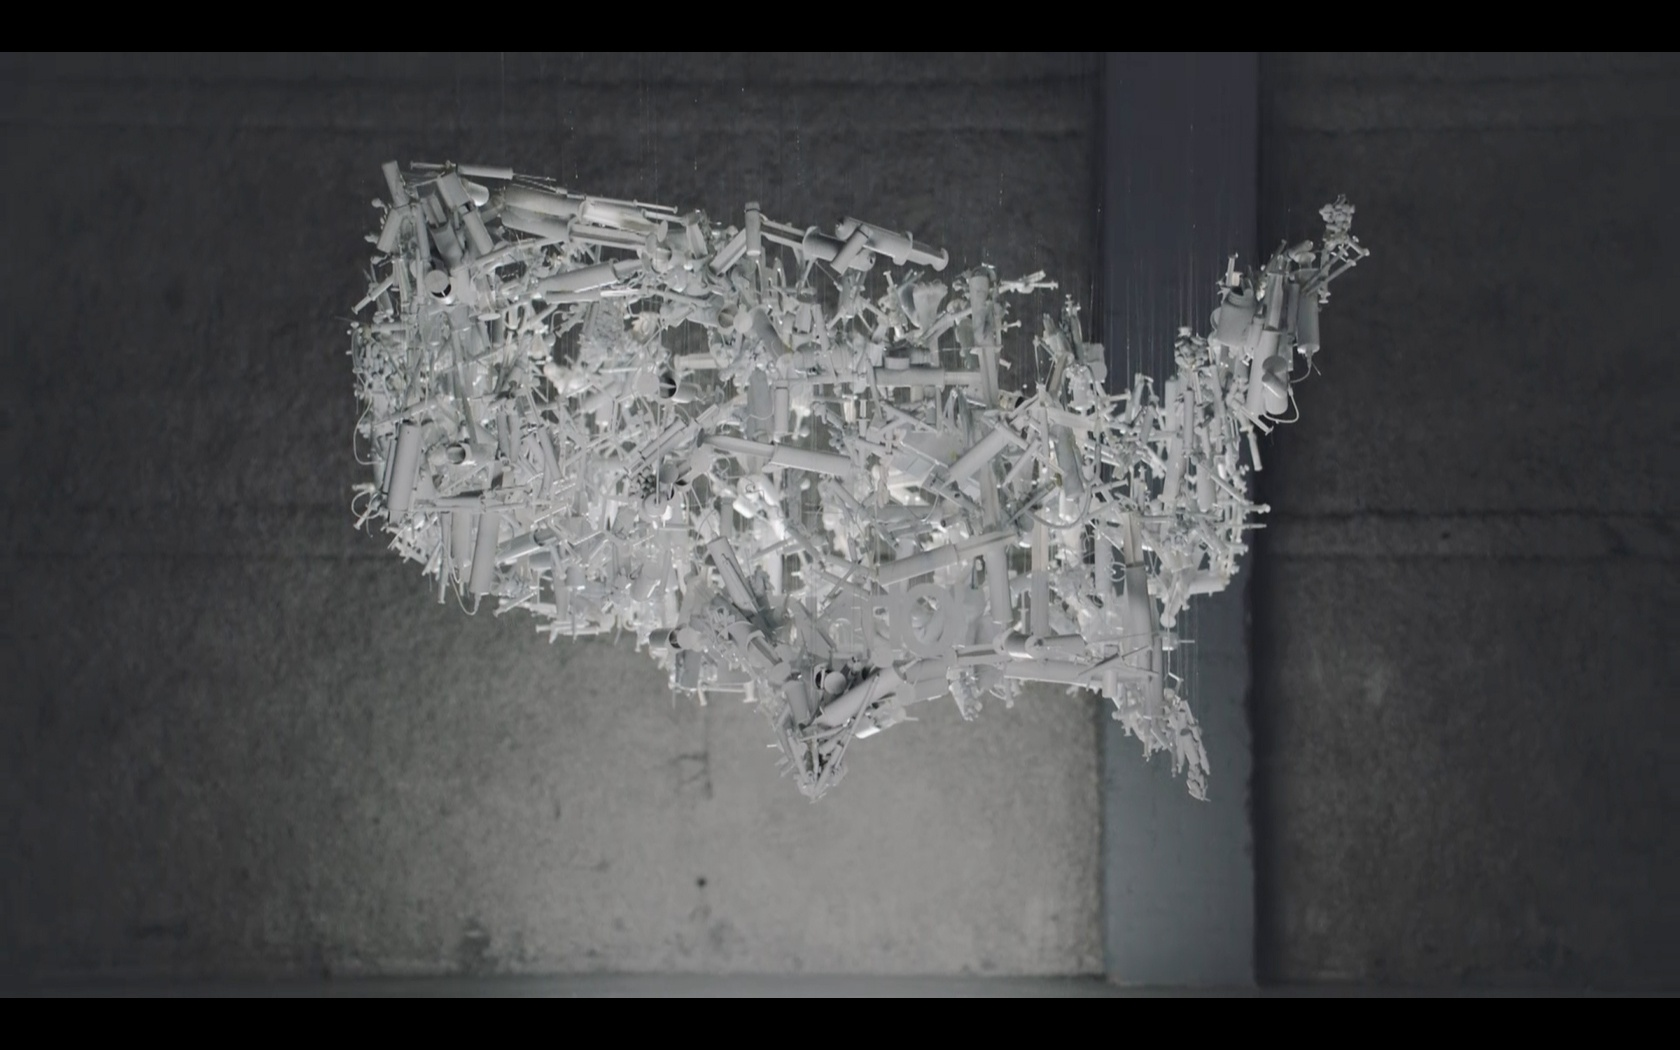 Thumbnail for A&E: Perceptual Art Pieces